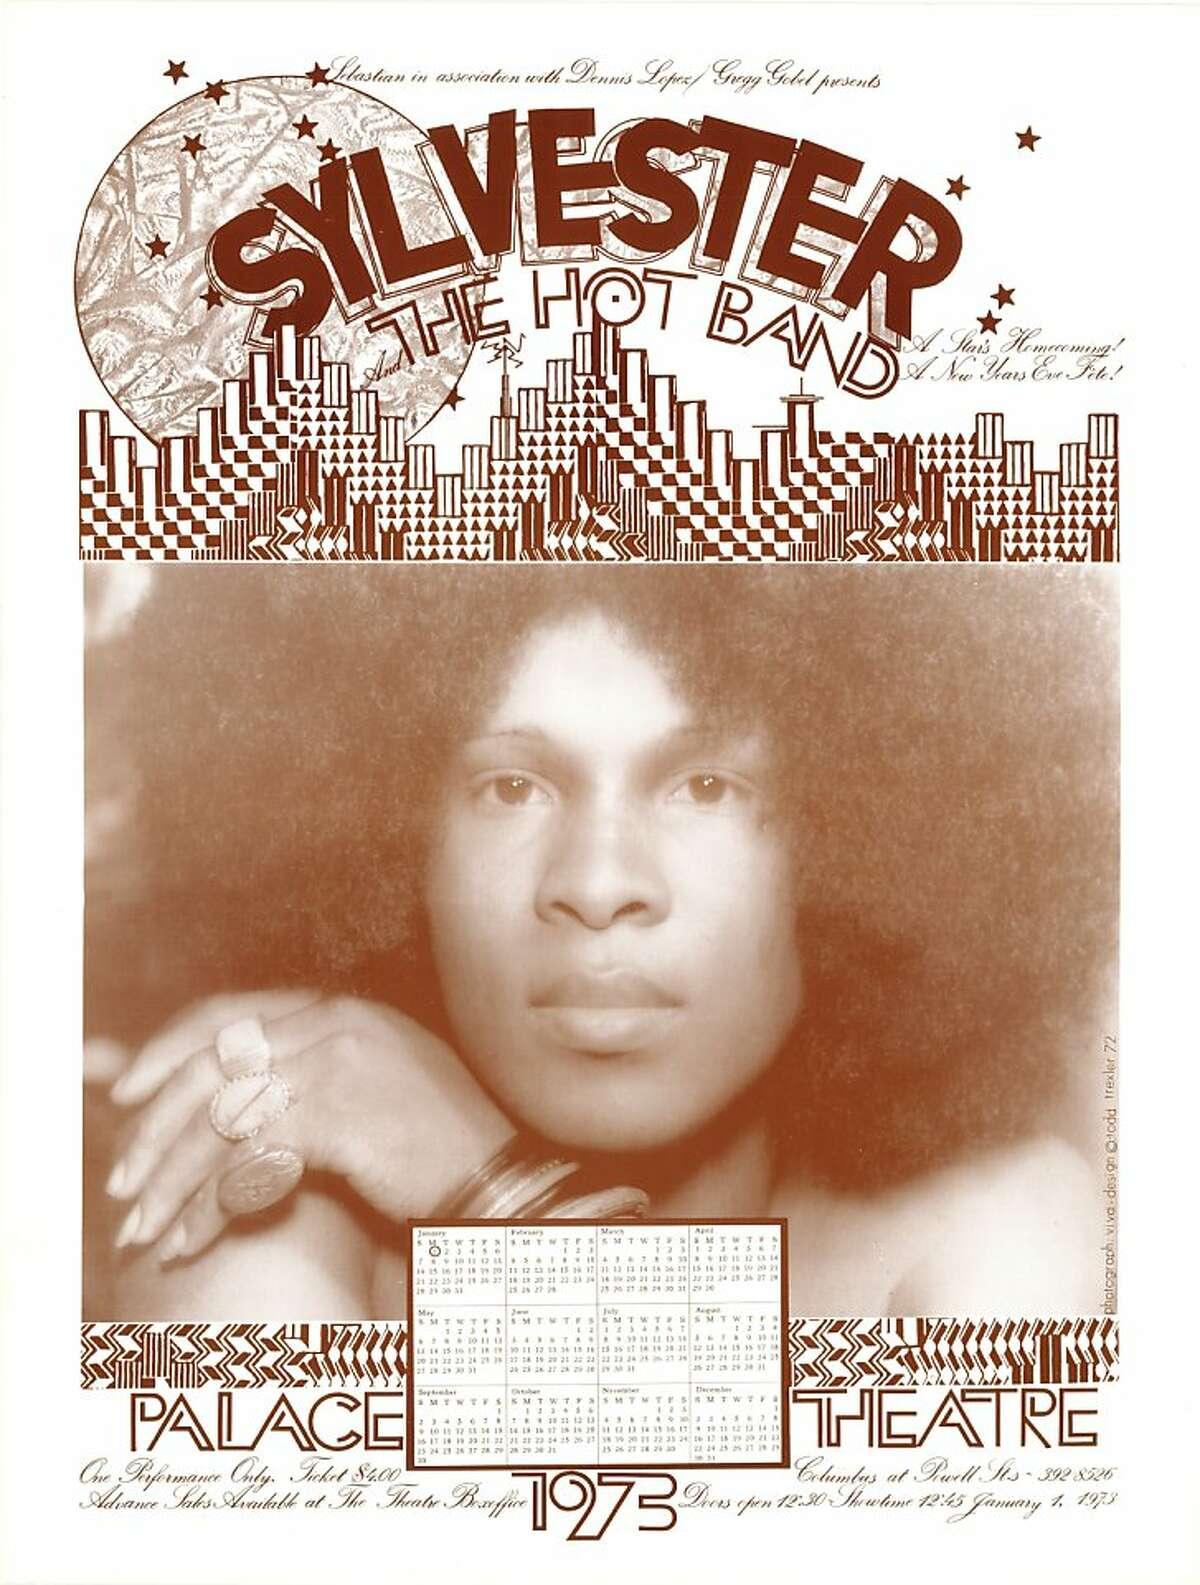 Sebastian, Dennis Lopez & Greg Gobel, Sylvester & The Hot Band Palace Theater December 31, 1972